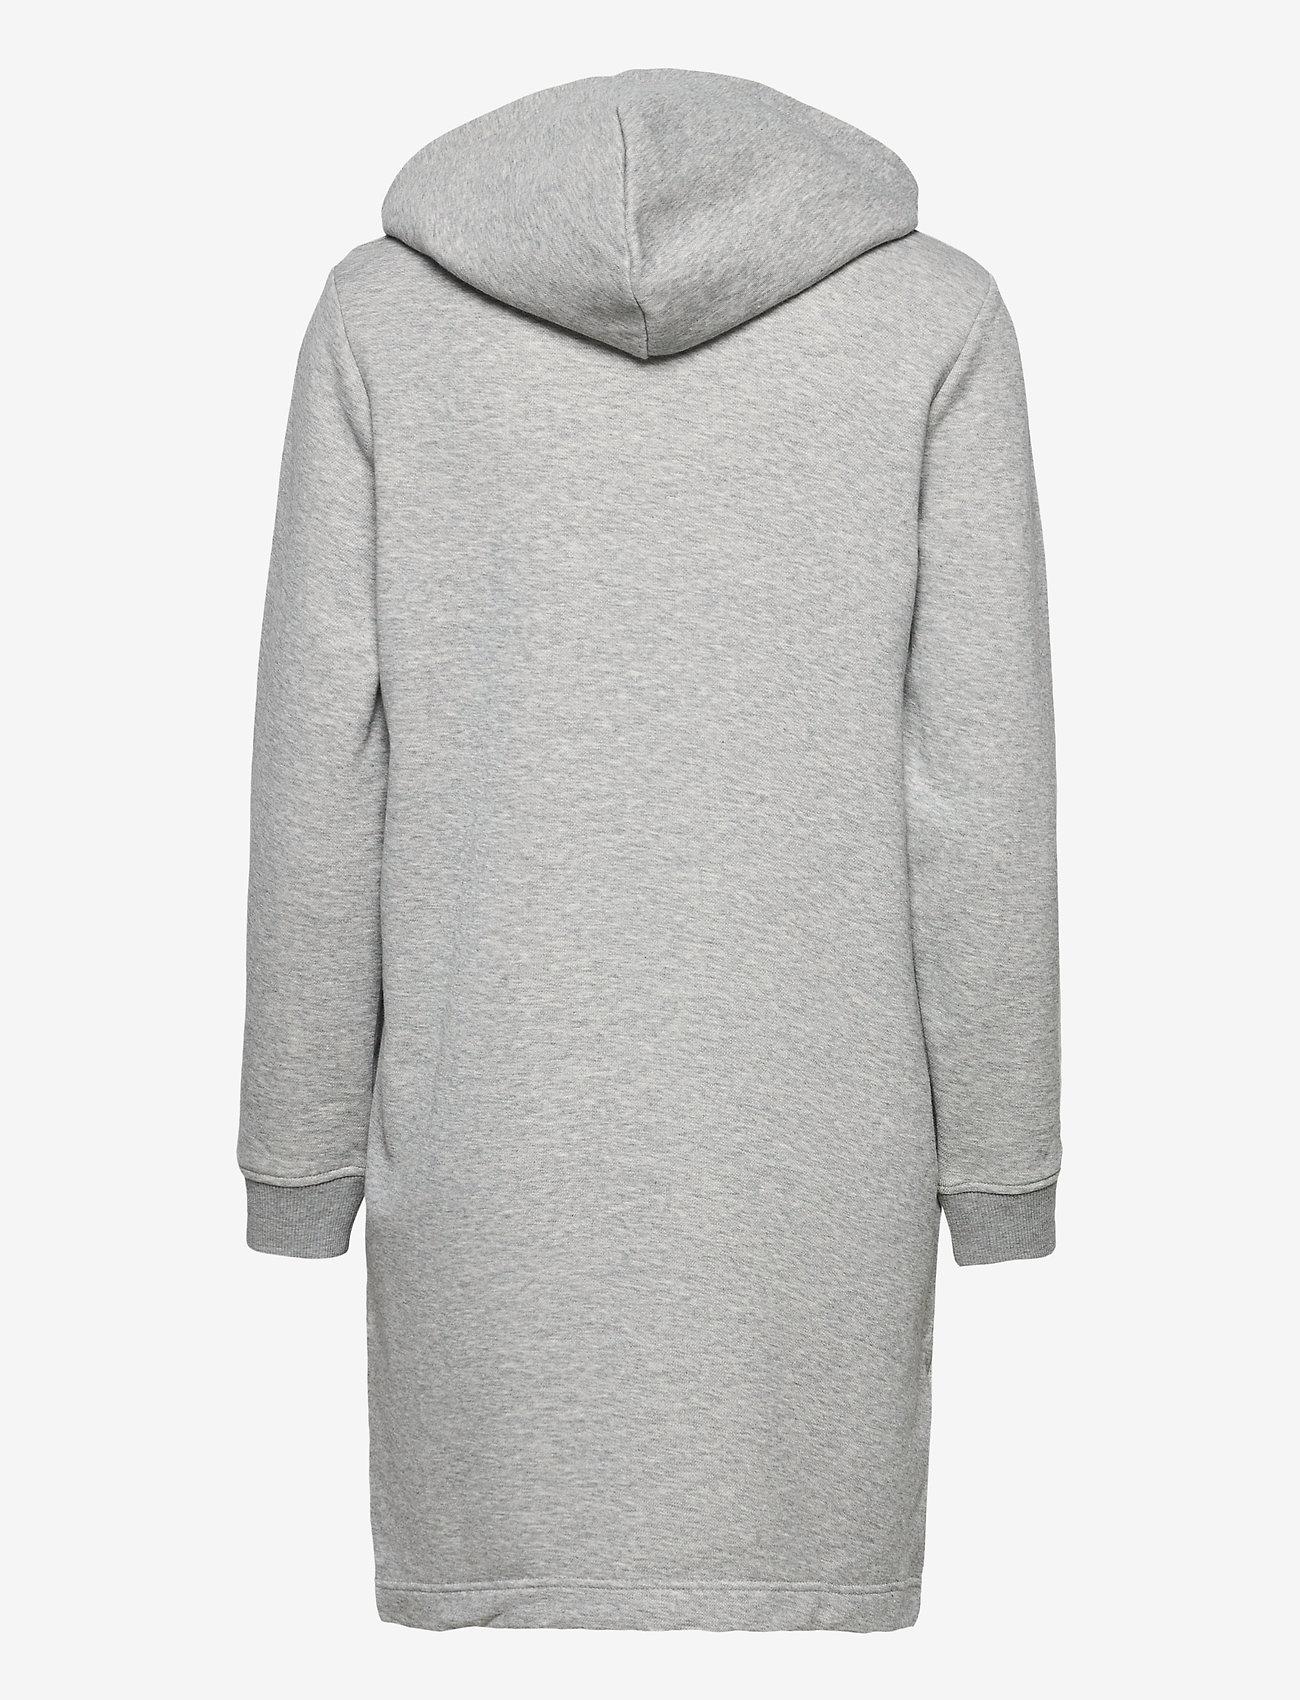 GANT - D1. ARCHIVE SHIELD HOODIE DRESS - short dresses - grey melange - 1